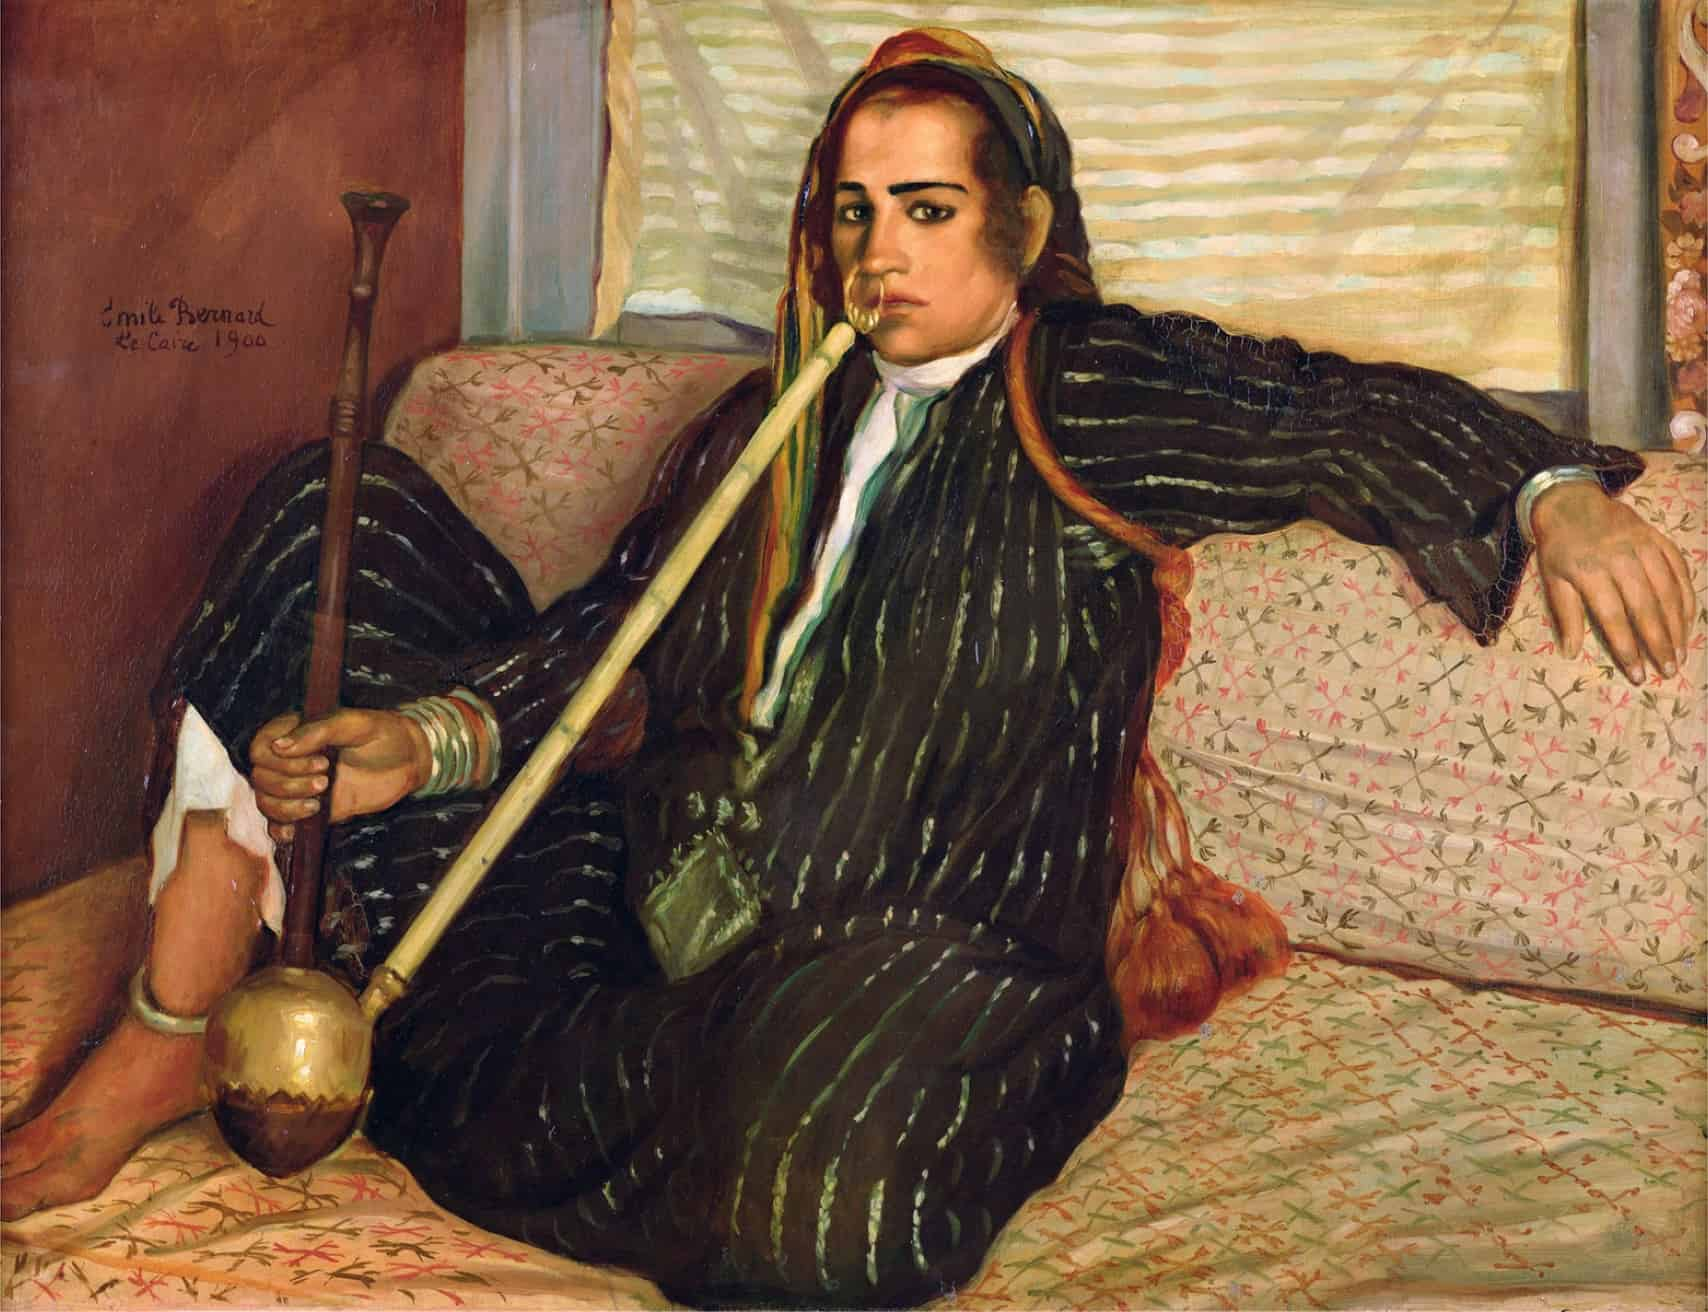 You are currently viewing Émile Bernard, La fumeuse de Haschisch